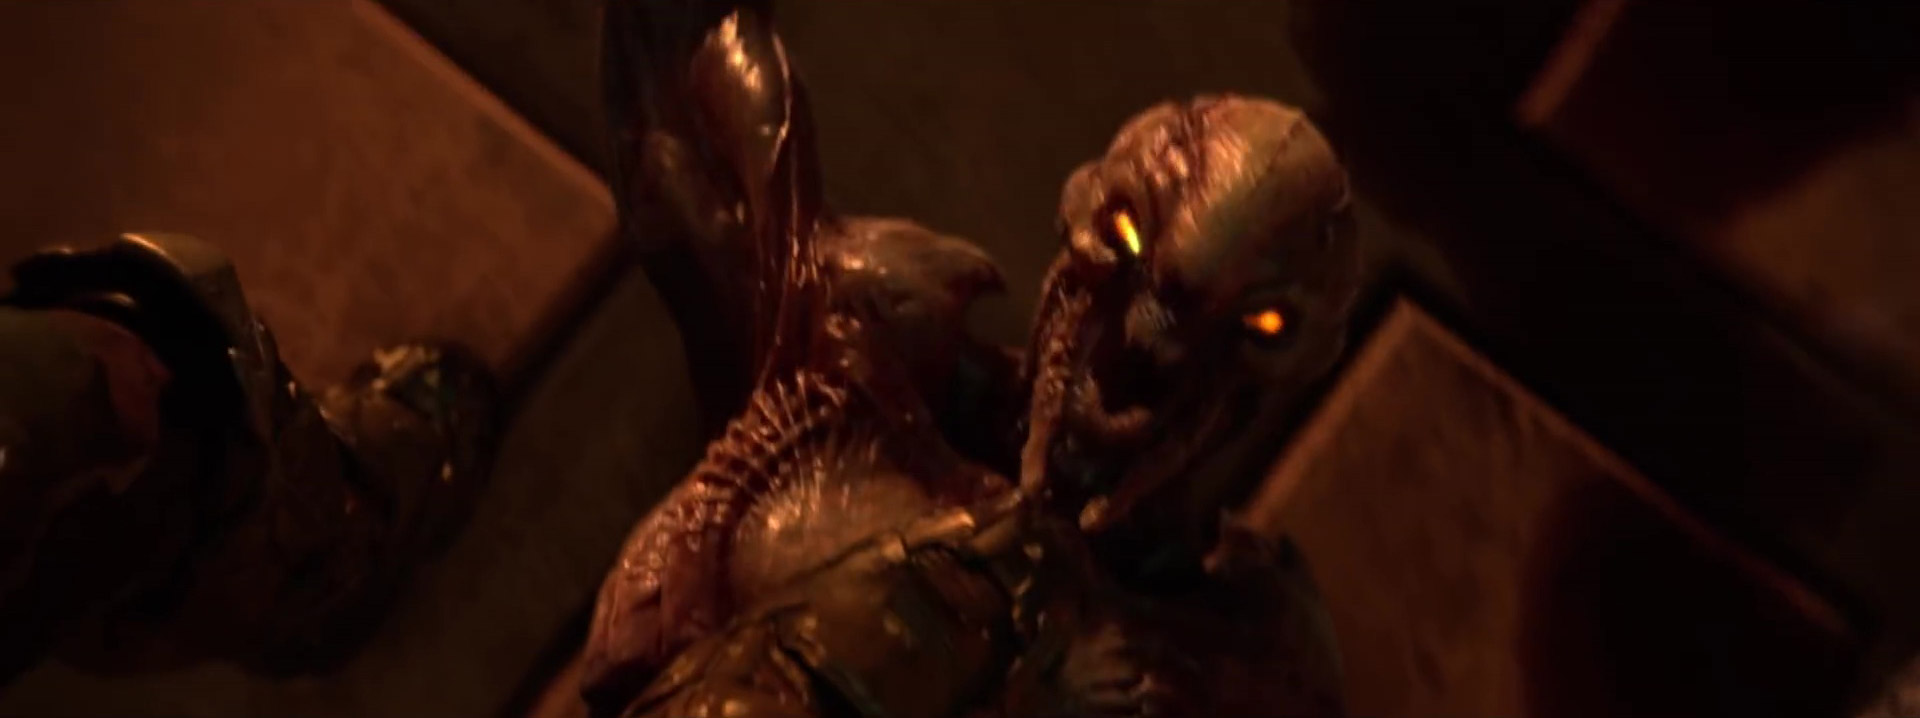 doom-2016-video-game-trailer-7